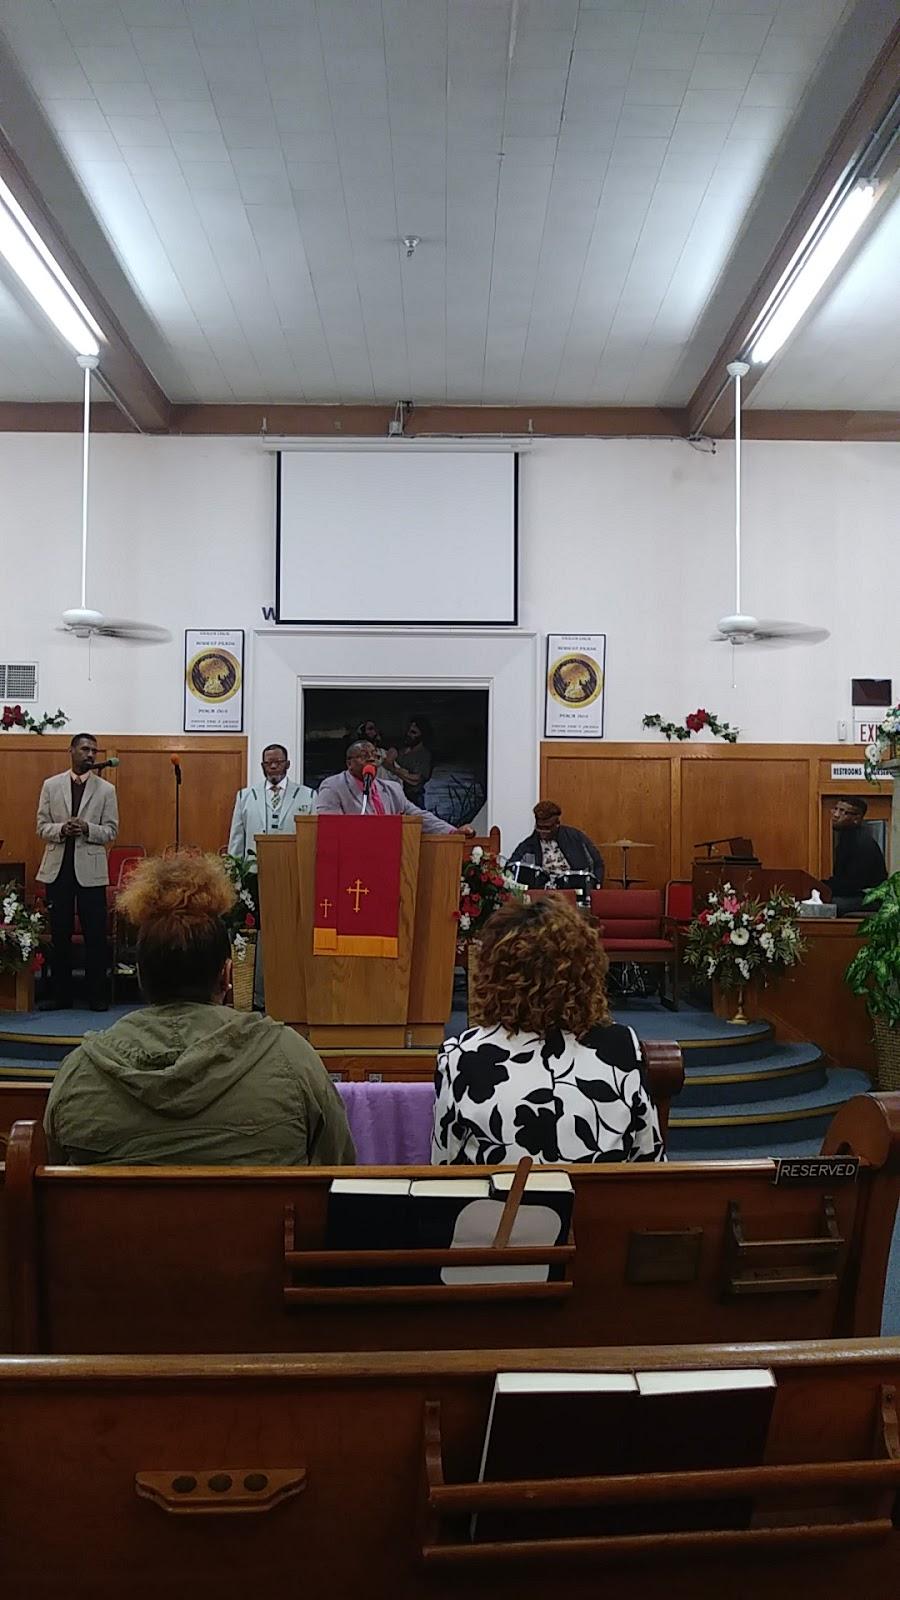 Shiloh Church of God in Christ - church  | Photo 3 of 4 | Address: 1707 Harrison St, Melissa, TX 75454, USA | Phone: (972) 838-9377